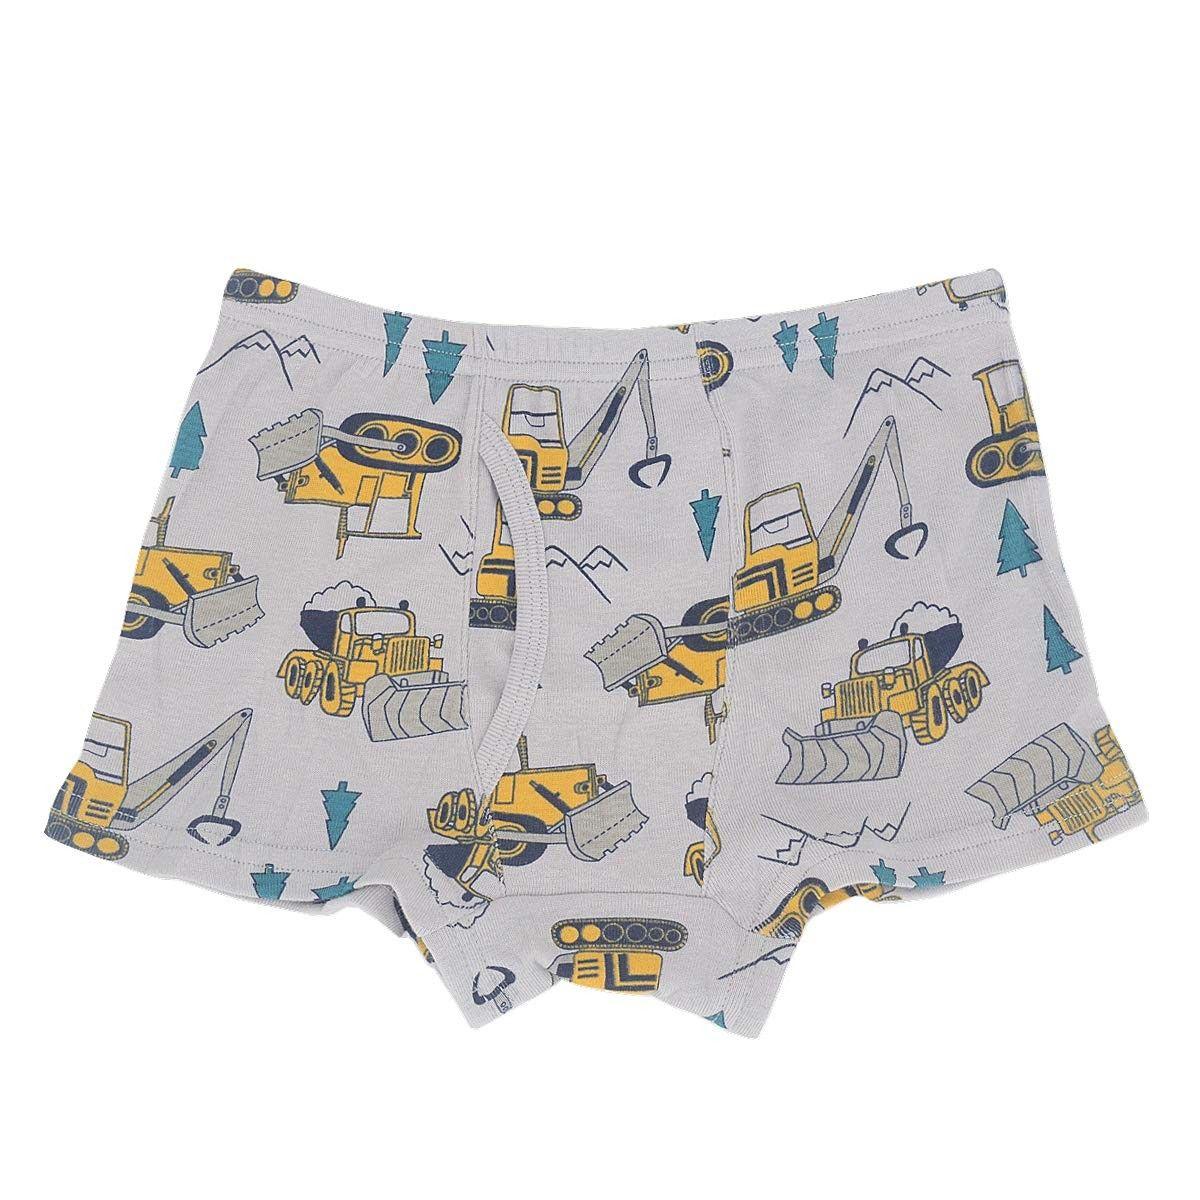 10 Pack Boys Kids Briefs Shorts Underwear Children Trunks Cotton Boxers Pants